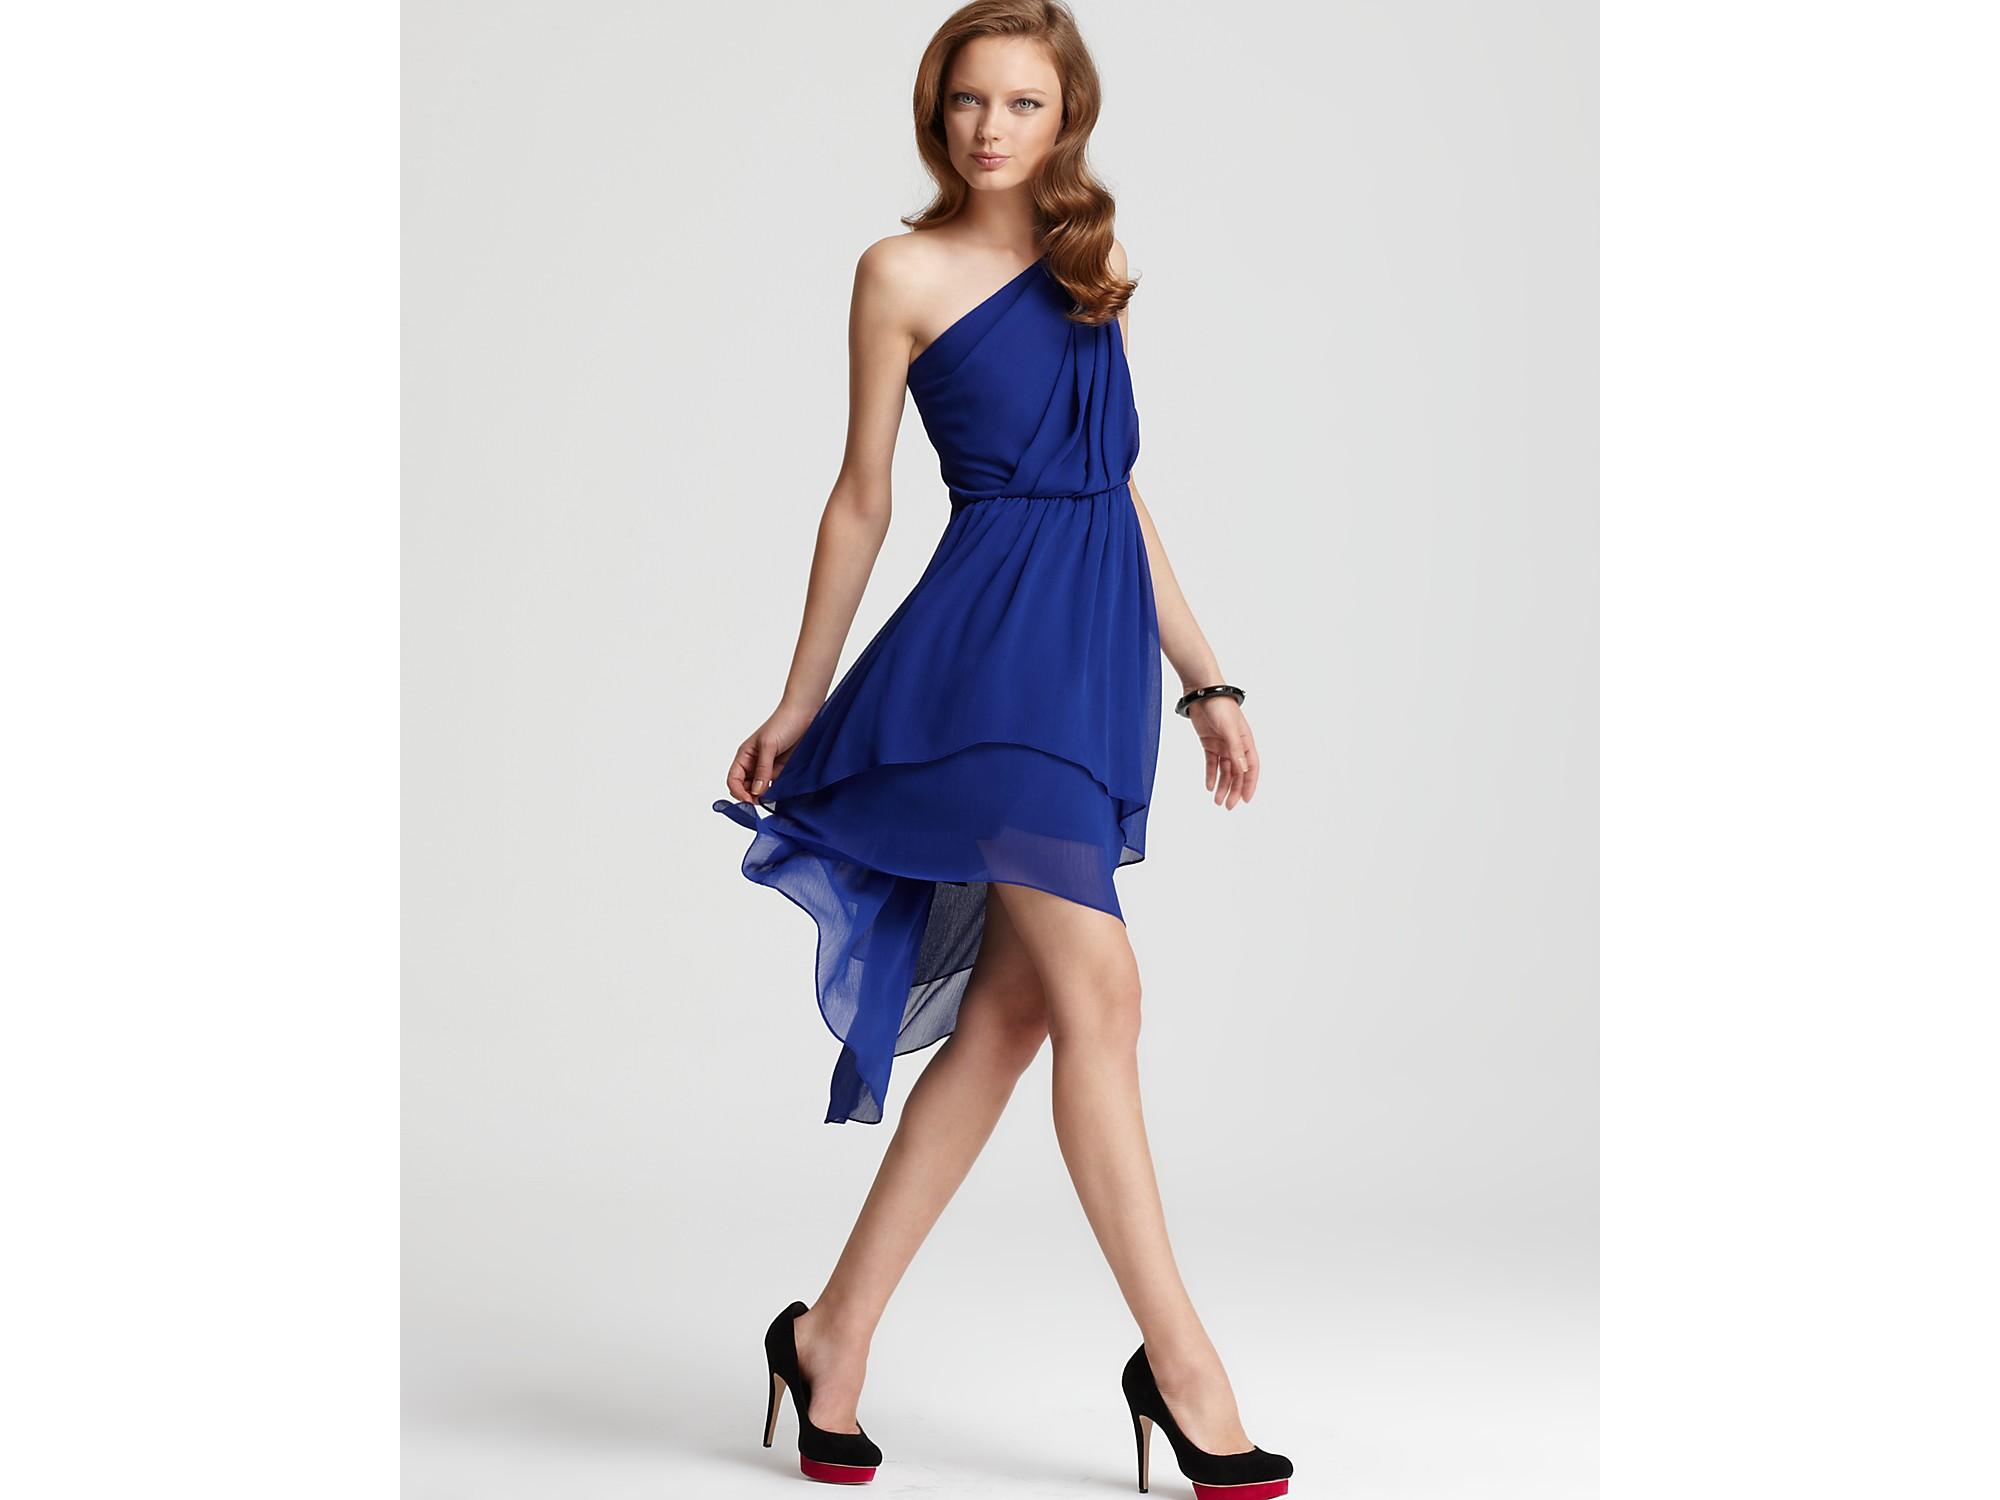 Max & cleo Dress Asymmetrical One Shoulder Dress in Blue | Lyst